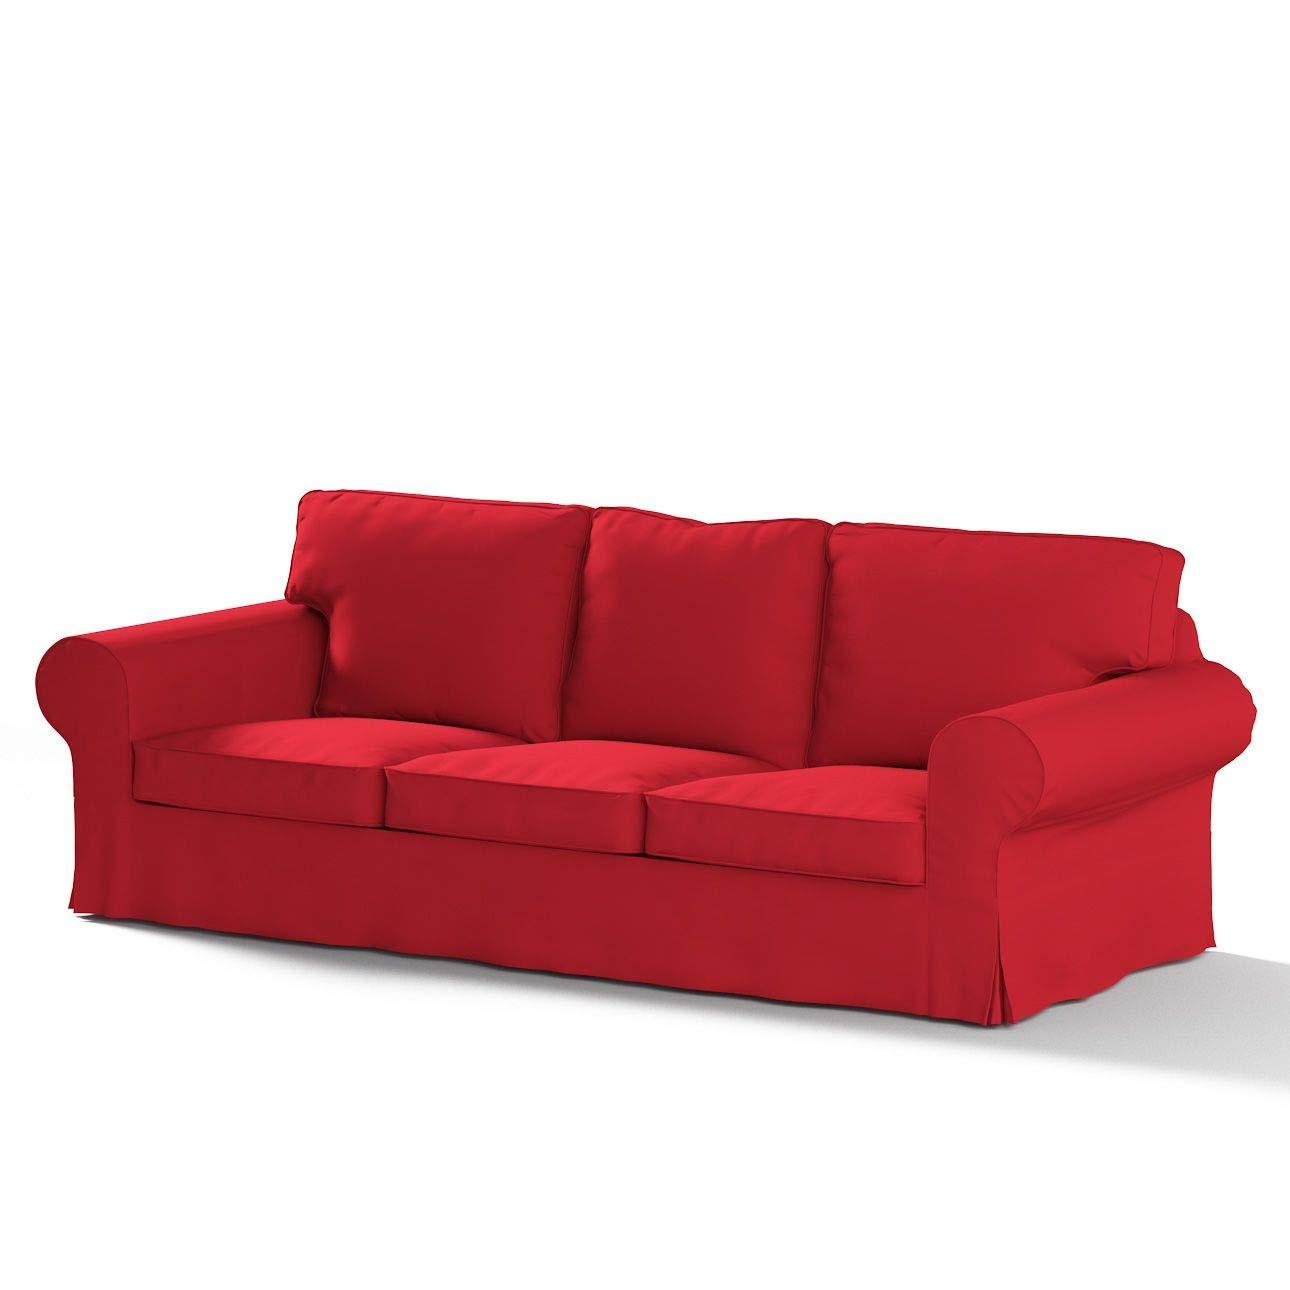 FRANC-TEXTIL 610-702-04 Ektorp 3-Sitzer Sofabezug Nicht ausklappbar, Cotton Panama, rot